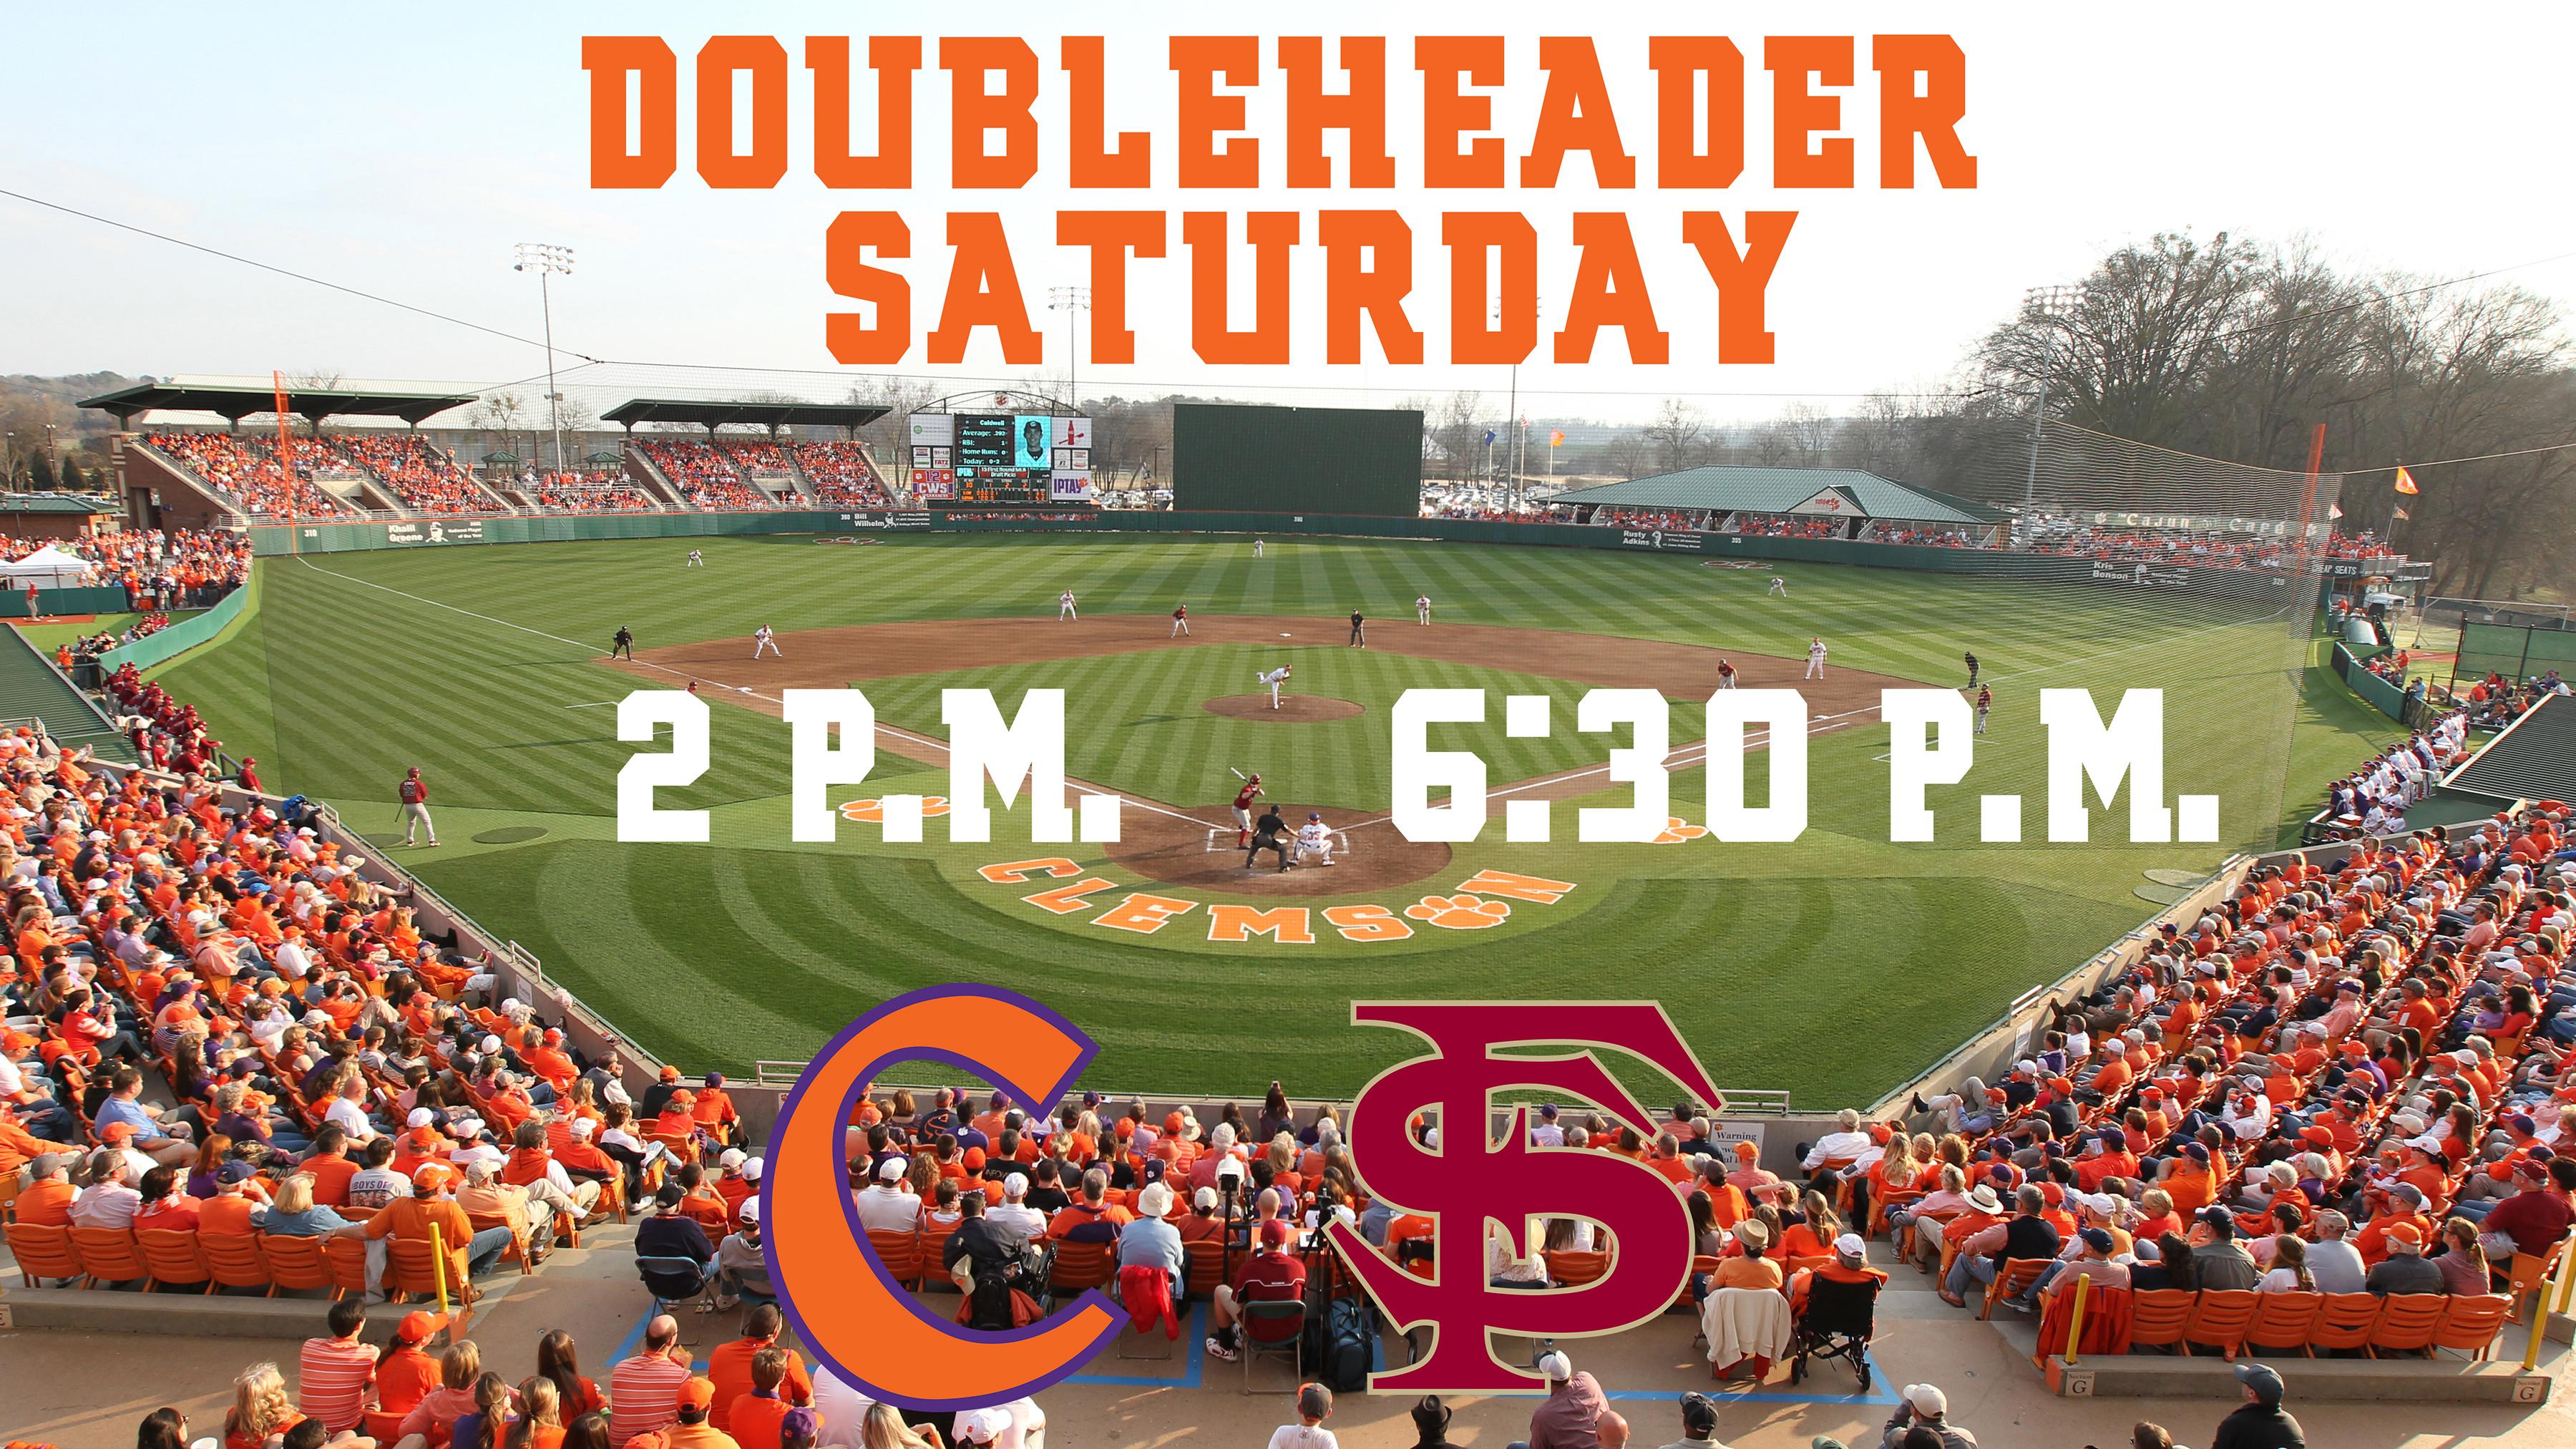 Tigers & Seminoles to Play Doubleheader Saturday